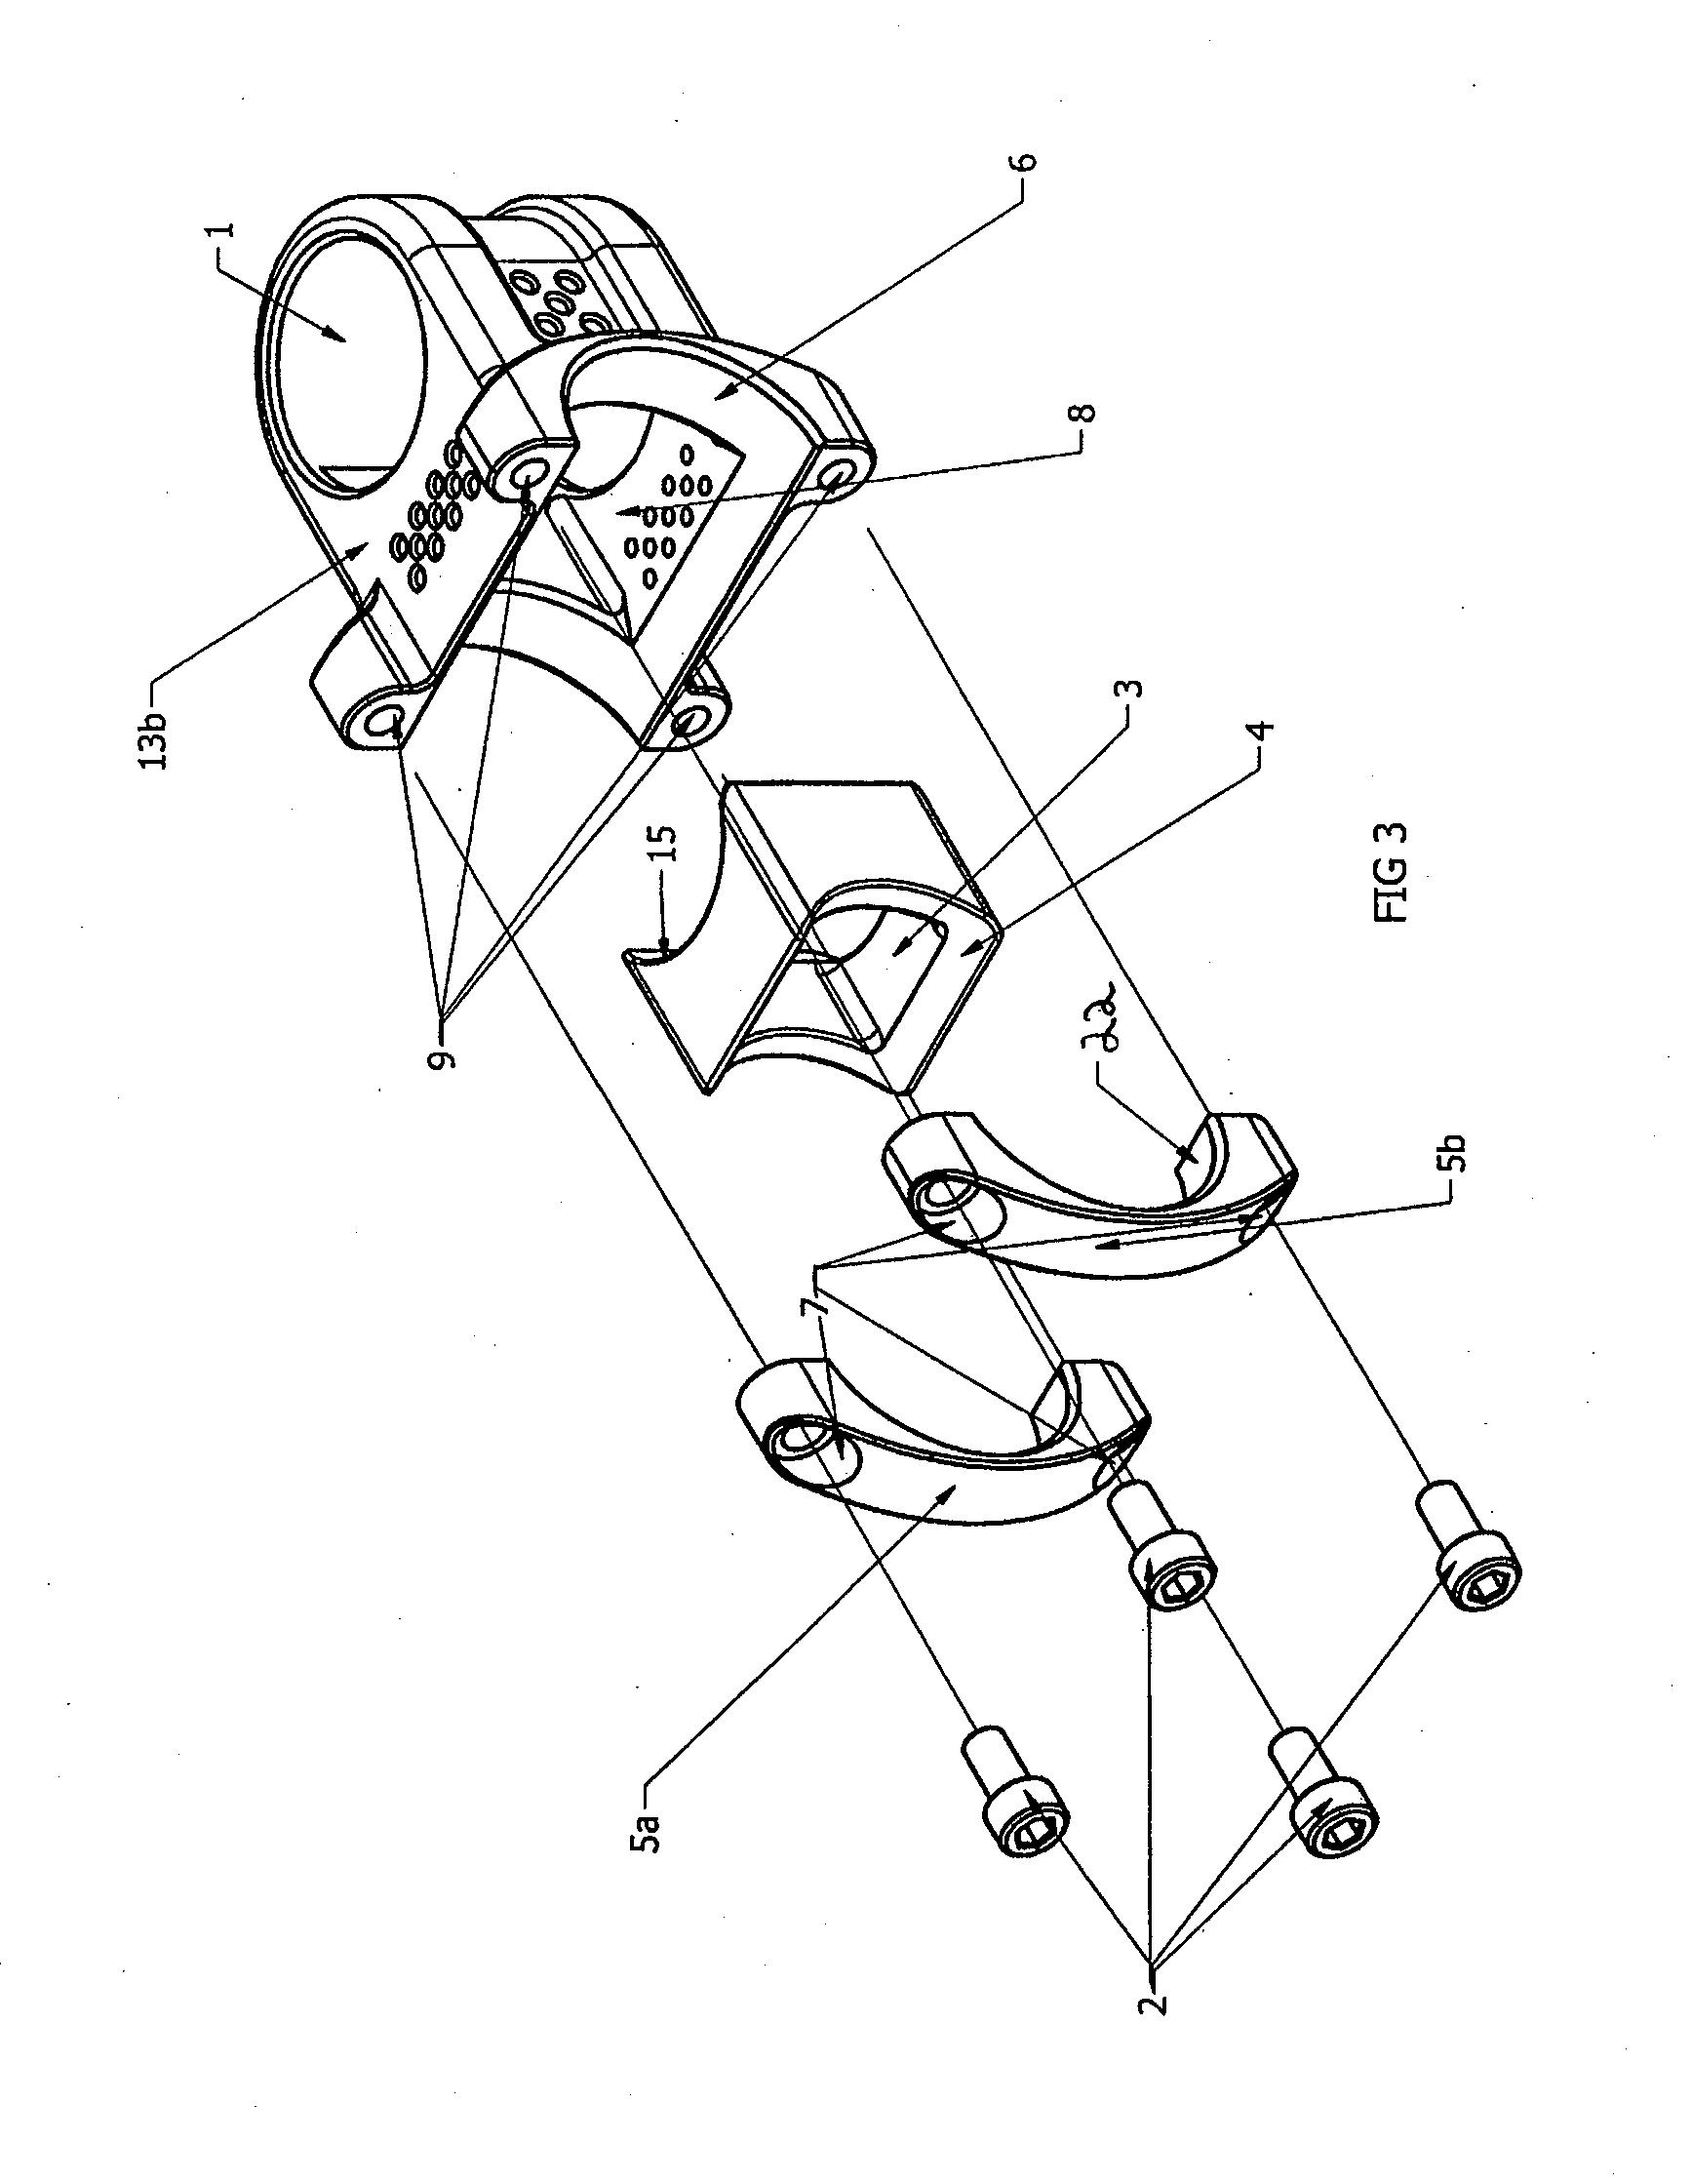 patent us20130263689 bike stem apparatus patents Isuzu Fuse Diagram patent drawing